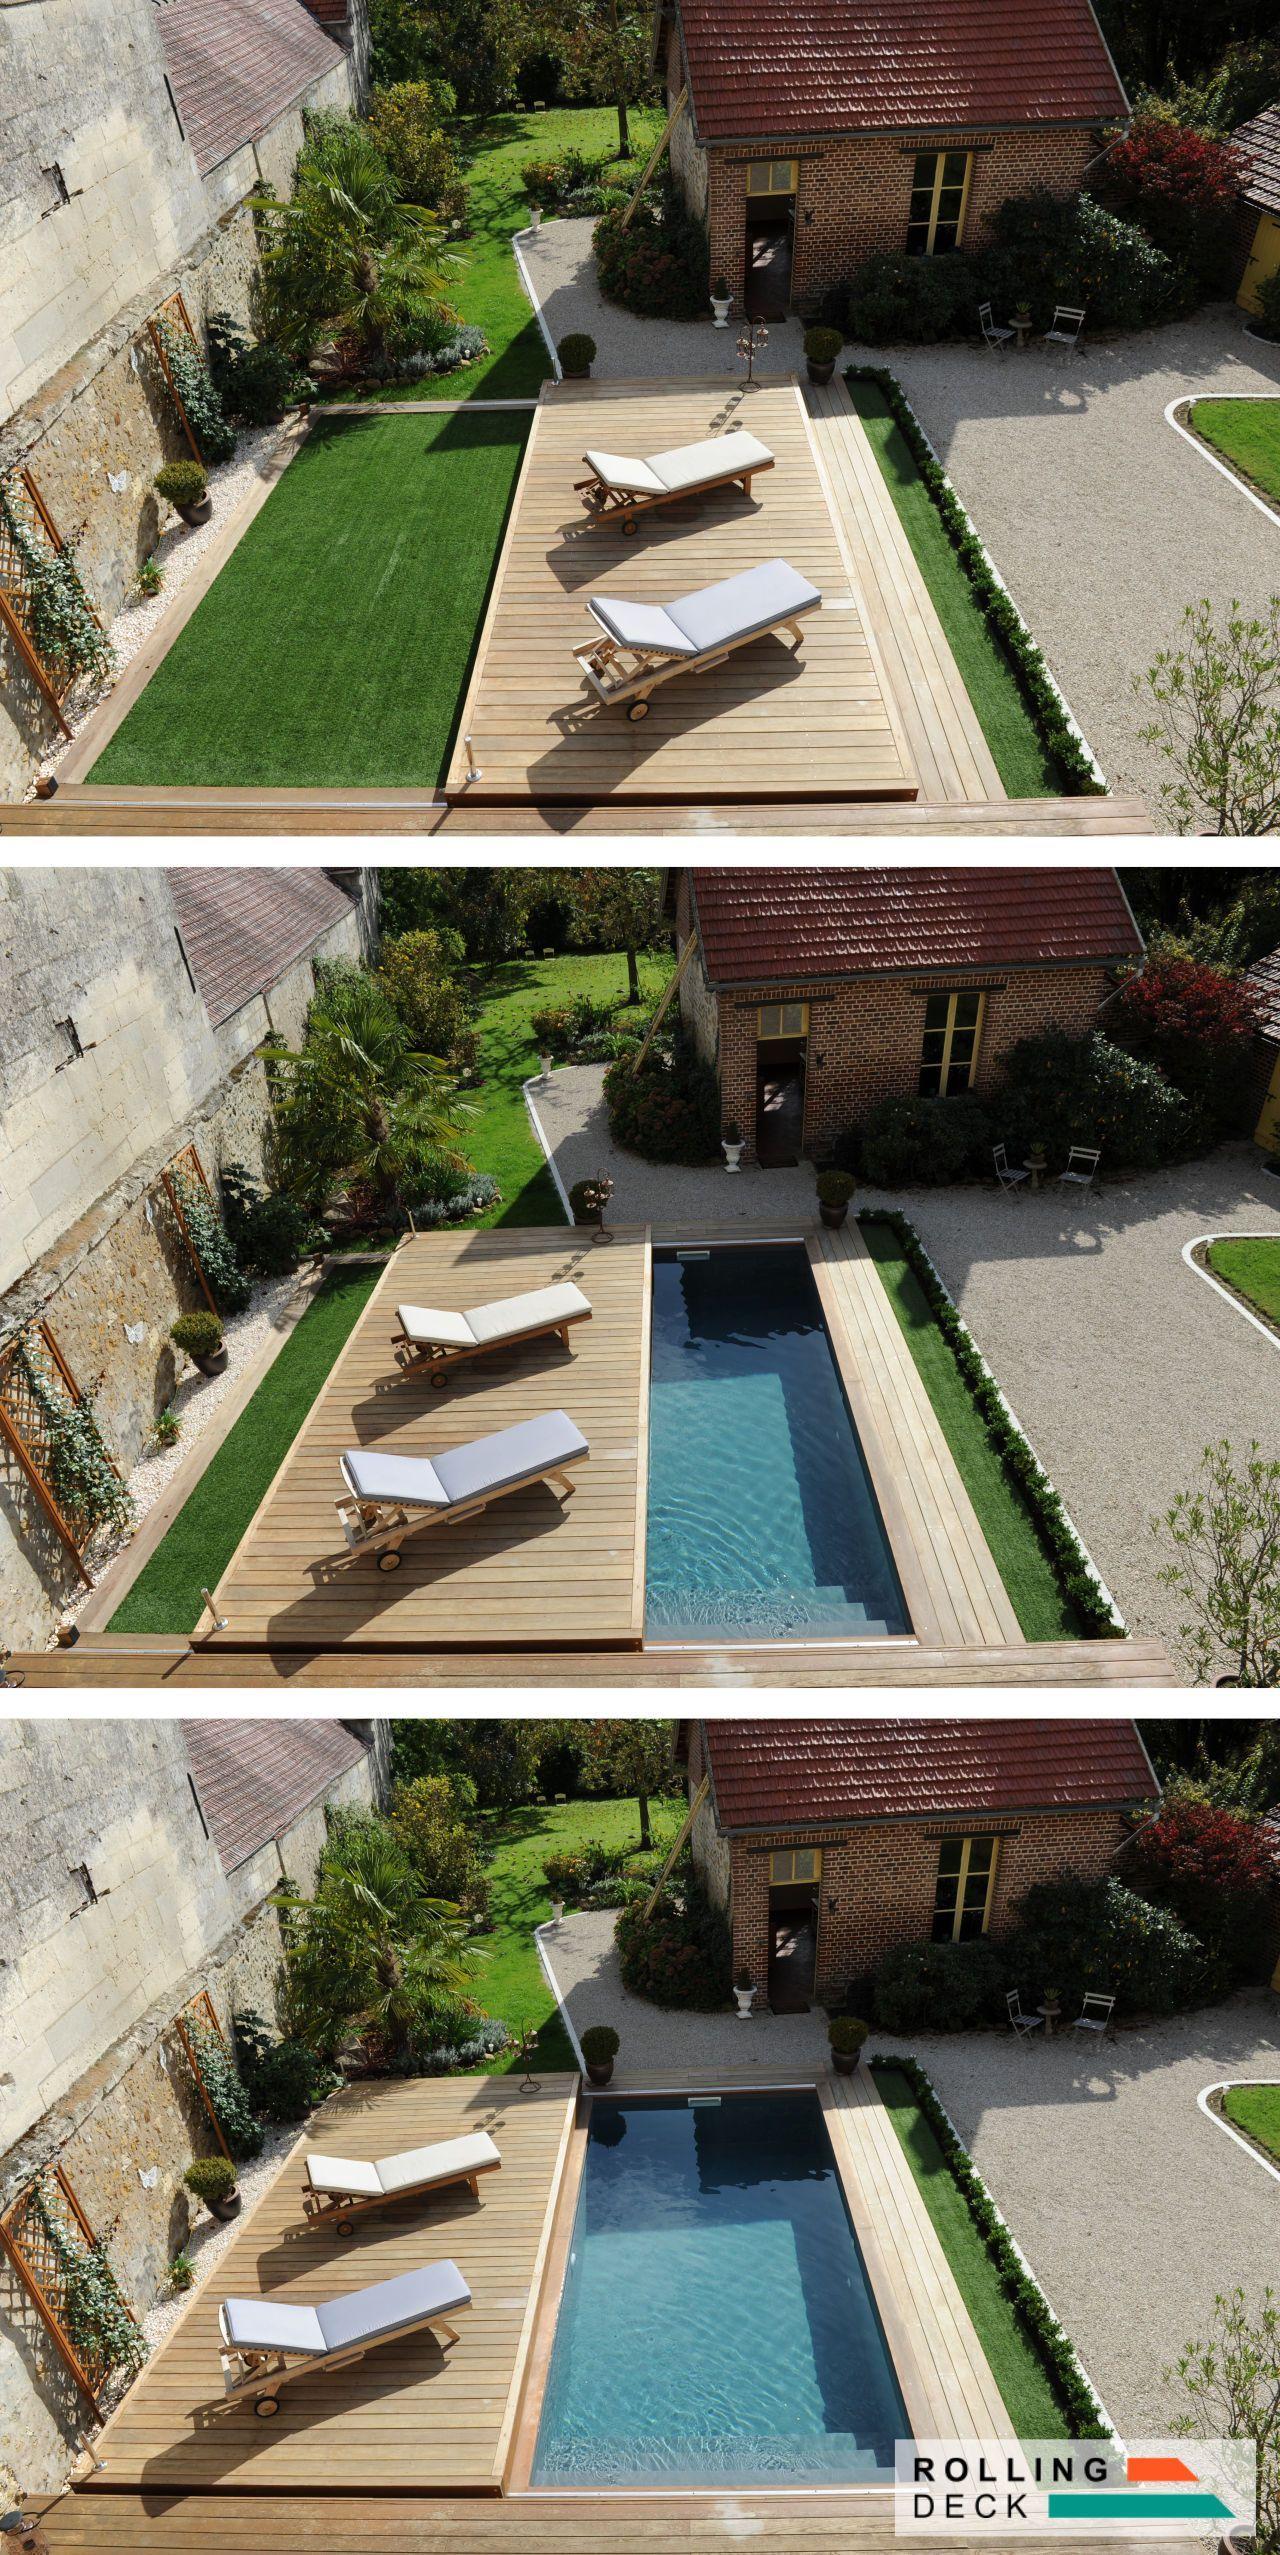 Rollingdeck #totalement #scurisant #terrasse #piscine ... serapportantà Bache Piscine Ete